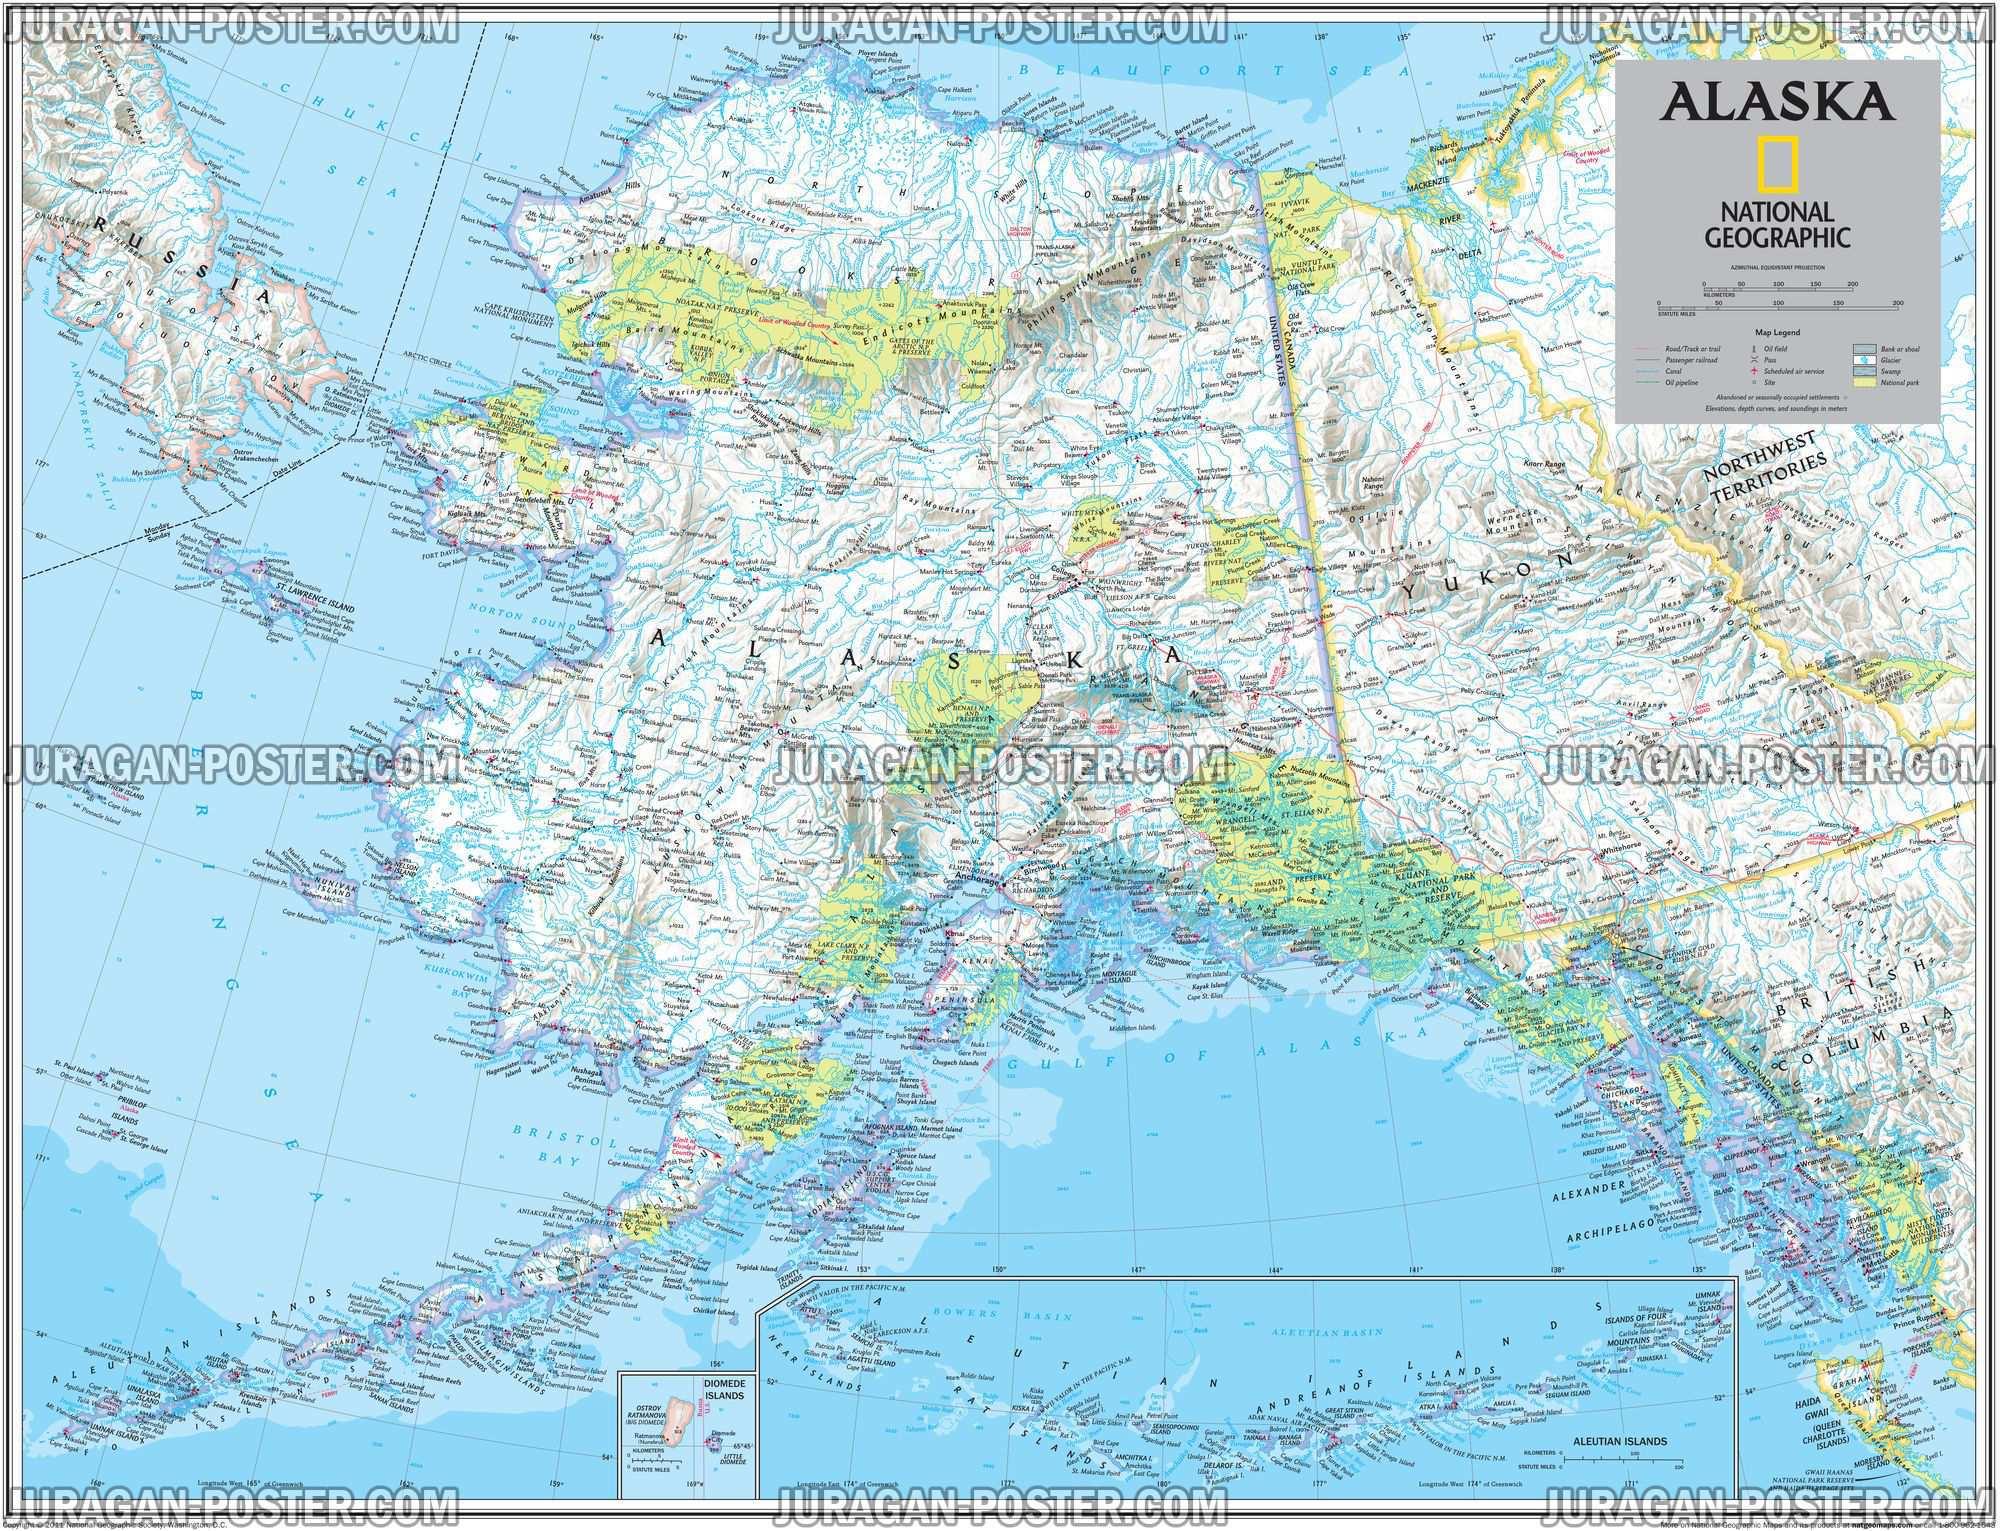 National geographic maps 02 jual poster di juragan poster ngm138united states alaska 2011 ngnea 120x156cm gumiabroncs Images